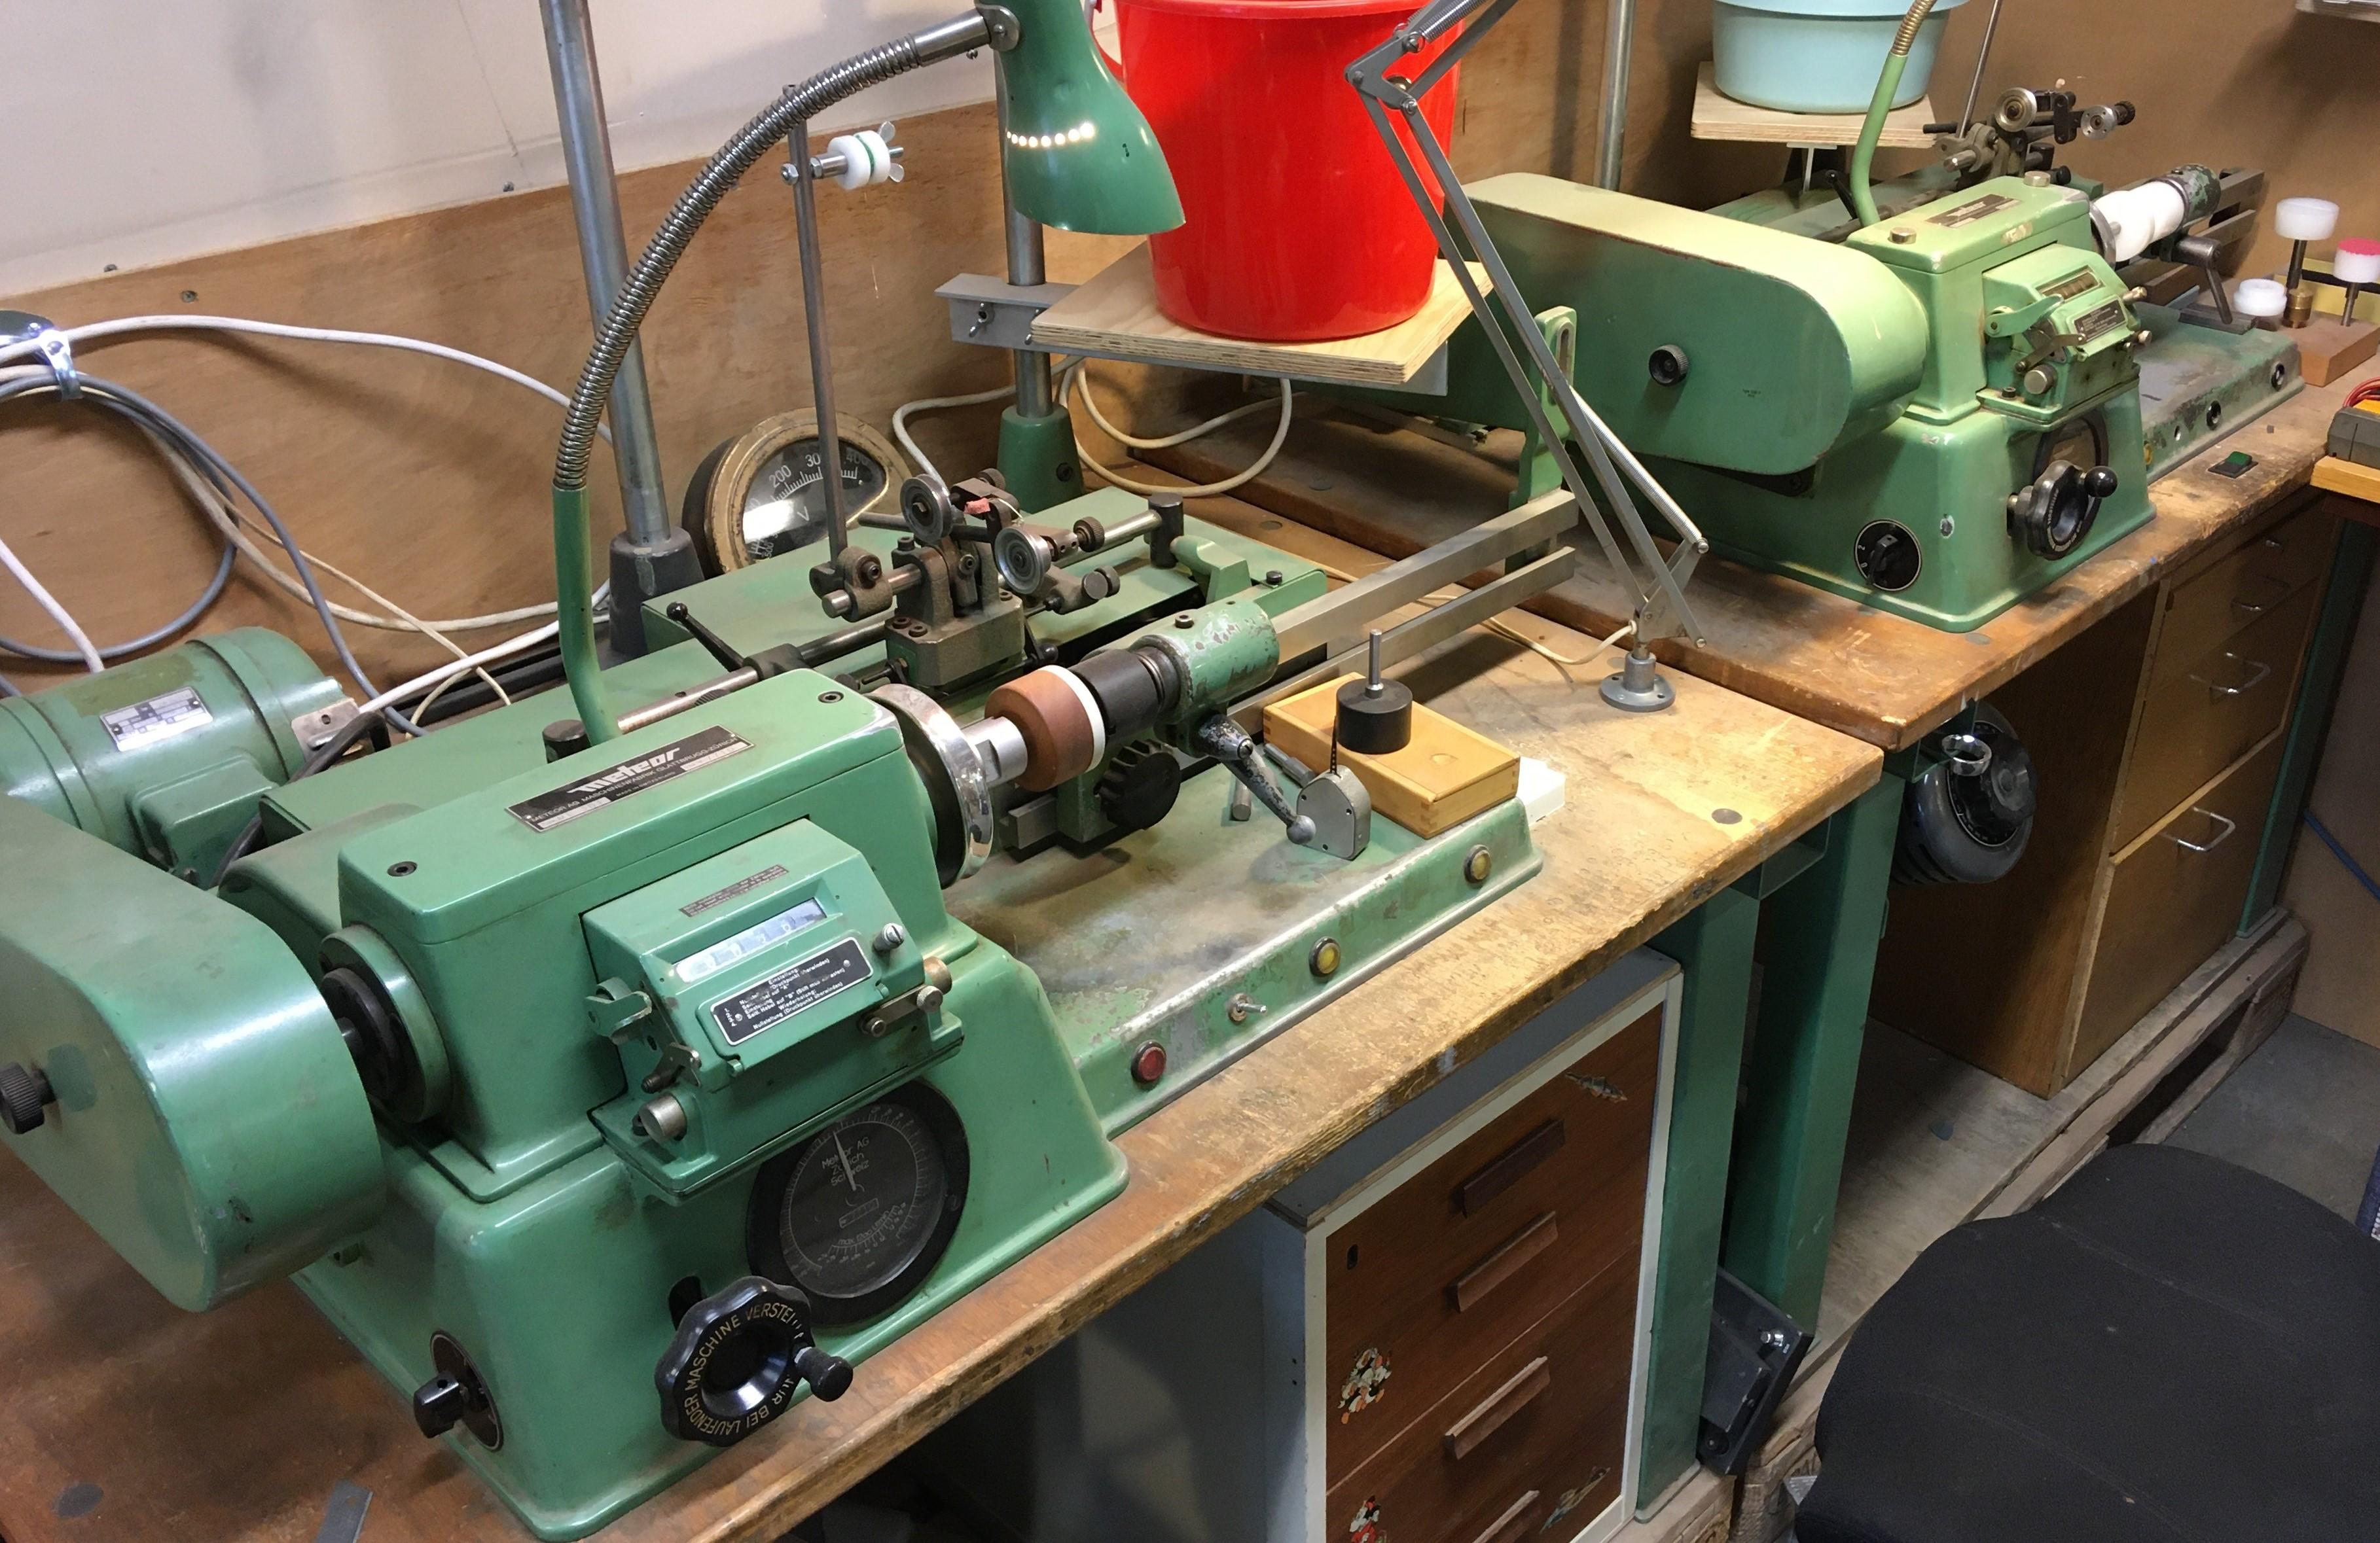 Stavemviklingsmaskin (2)